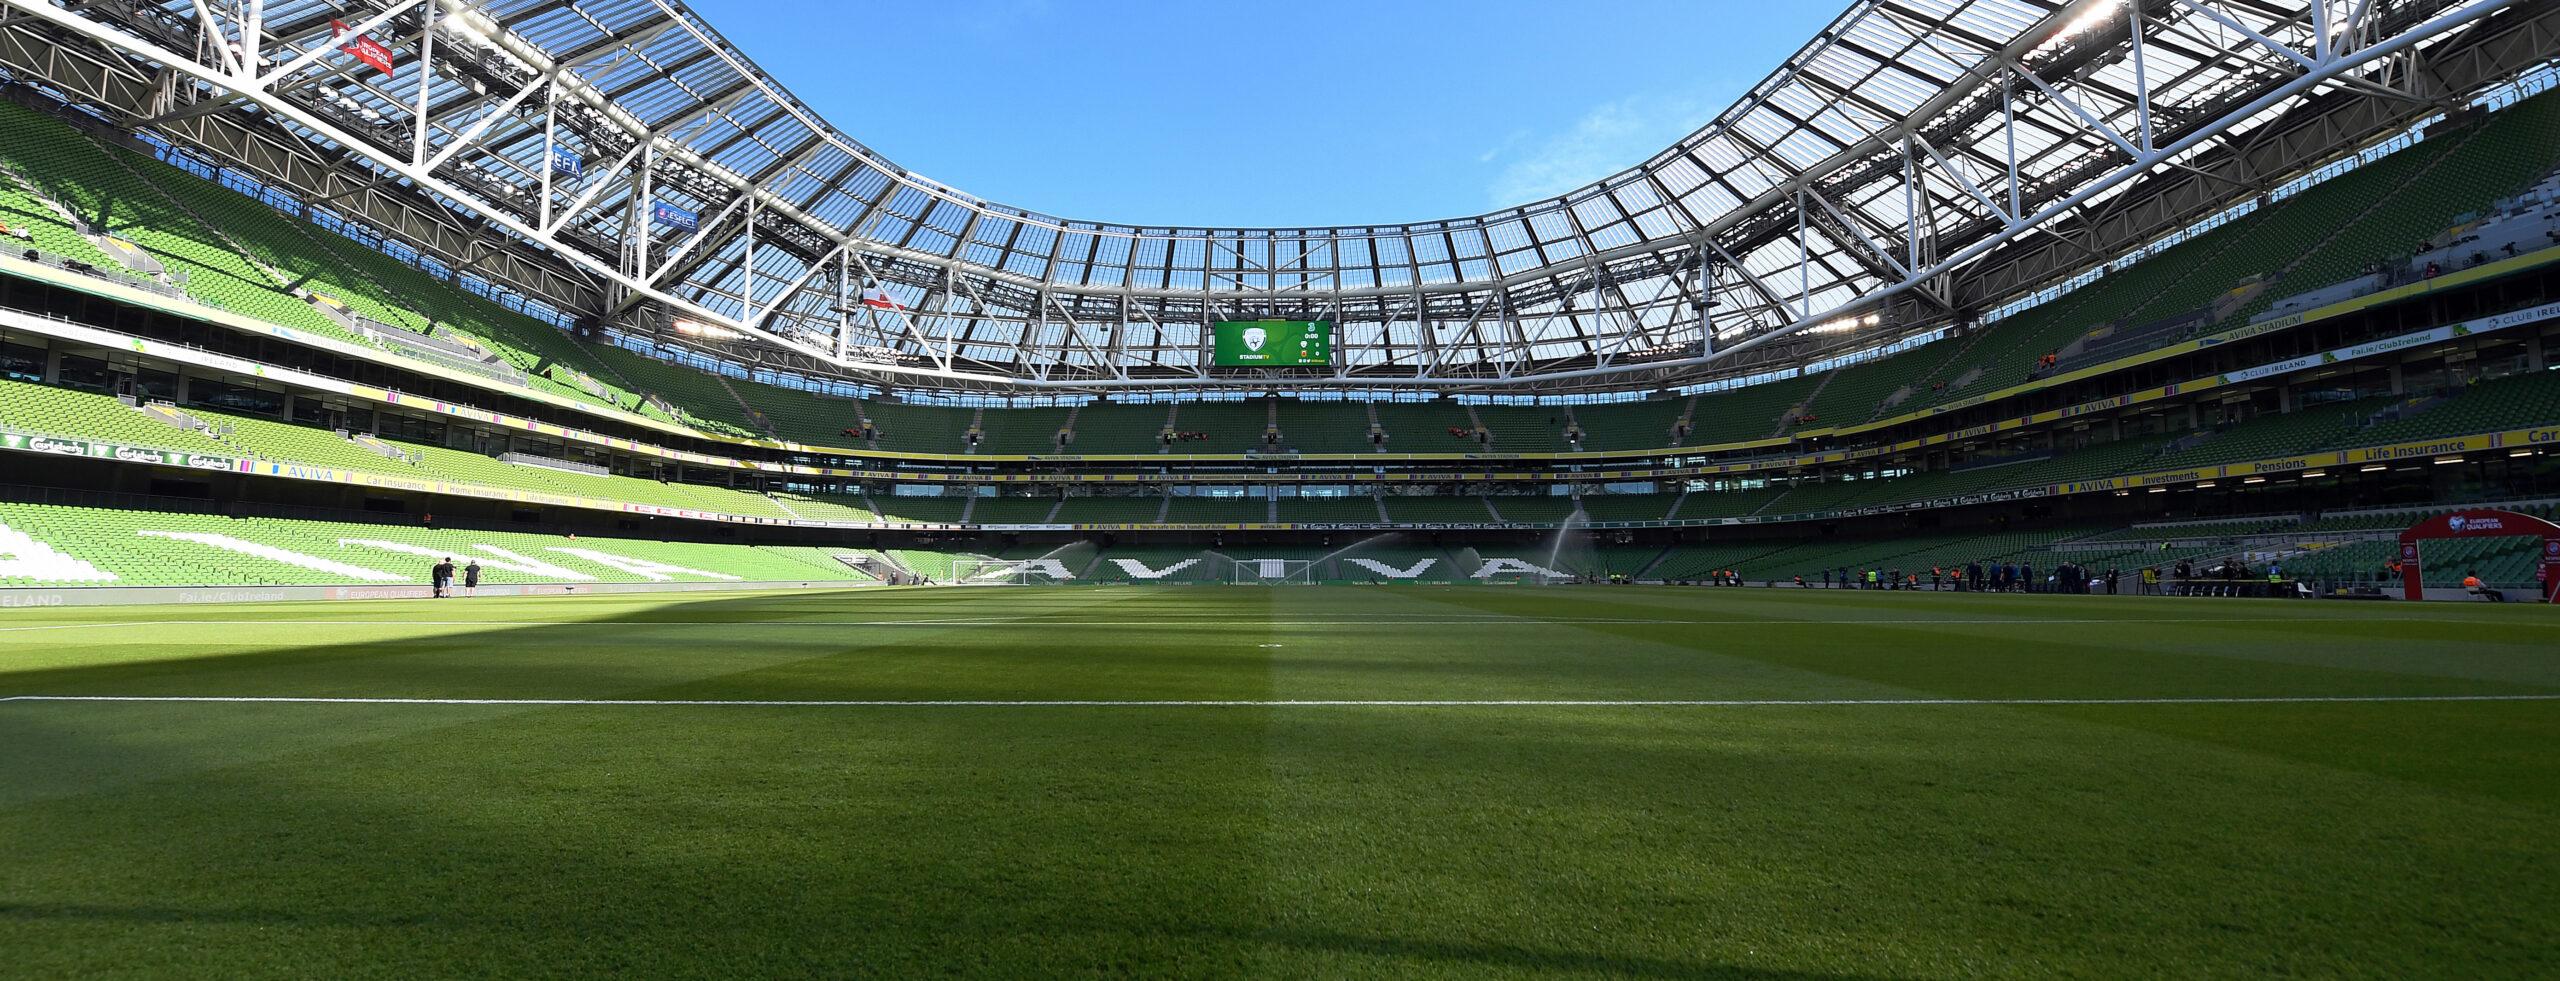 Republic of Ireland vs Luxembourg: Minnows provide tricky test